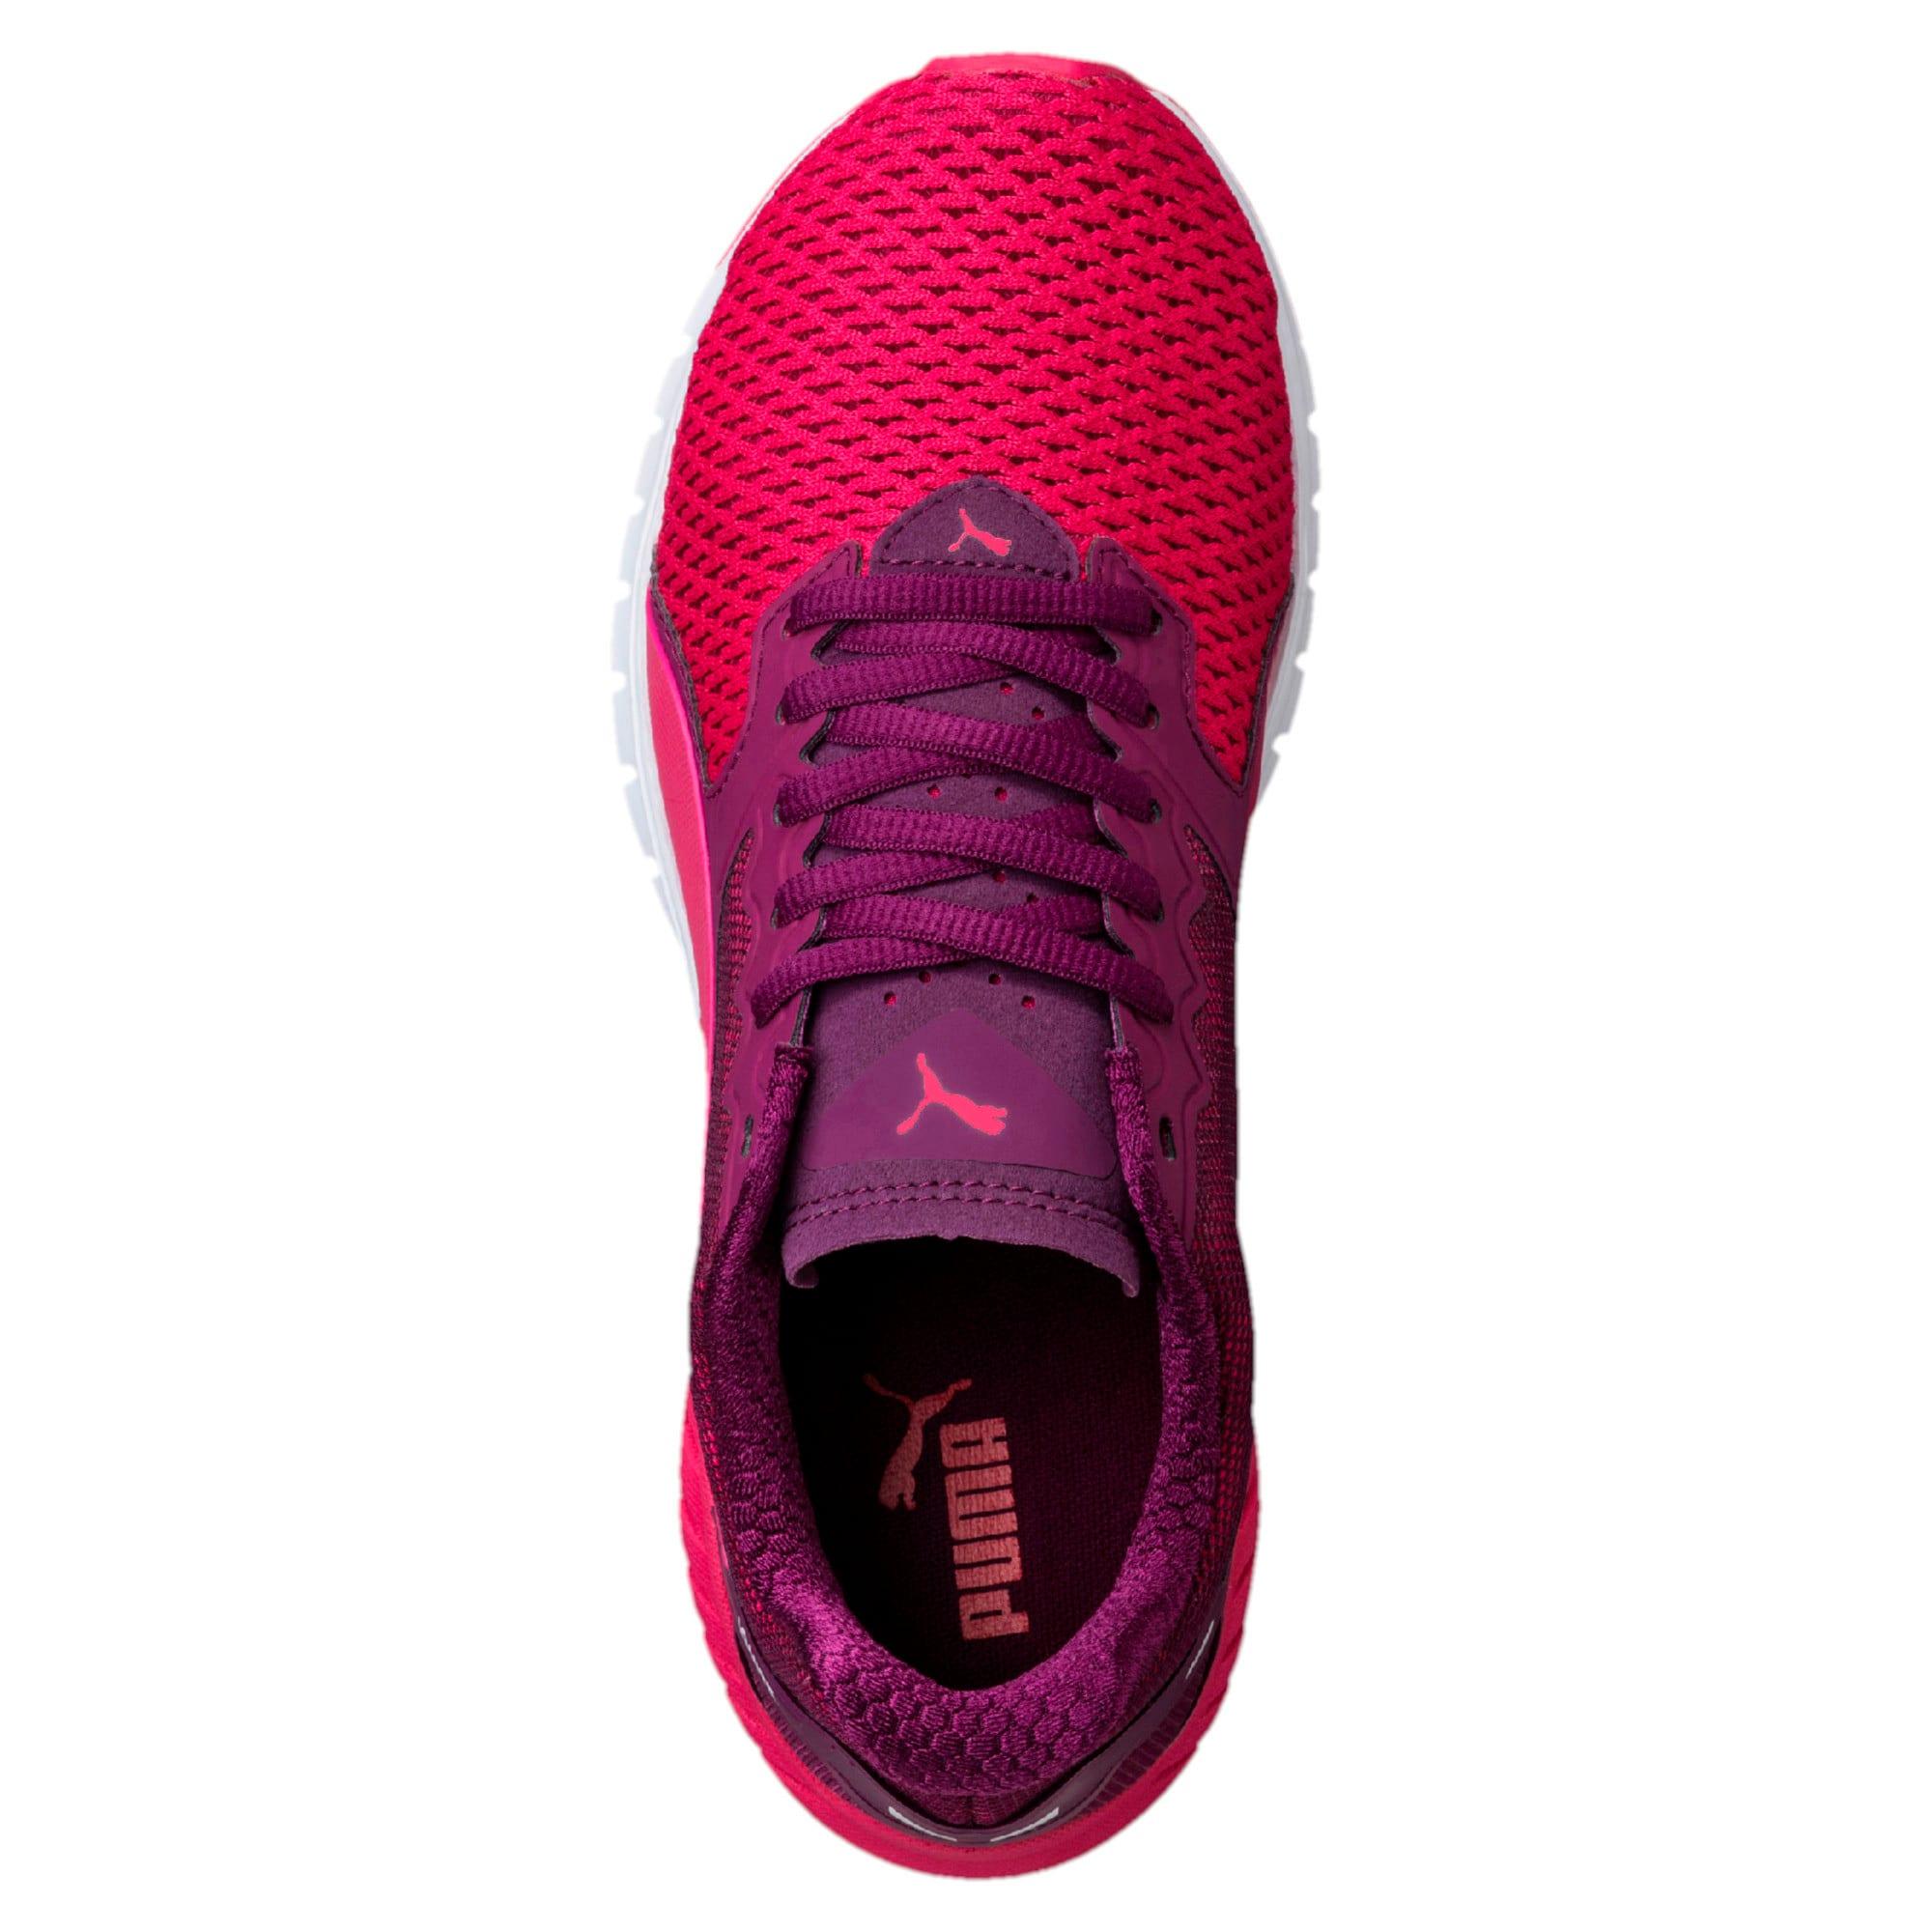 Thumbnail 4 of IGNITE Dual Mesh Kids' Running Shoes, Love Potion-Dark Purple, medium-IND